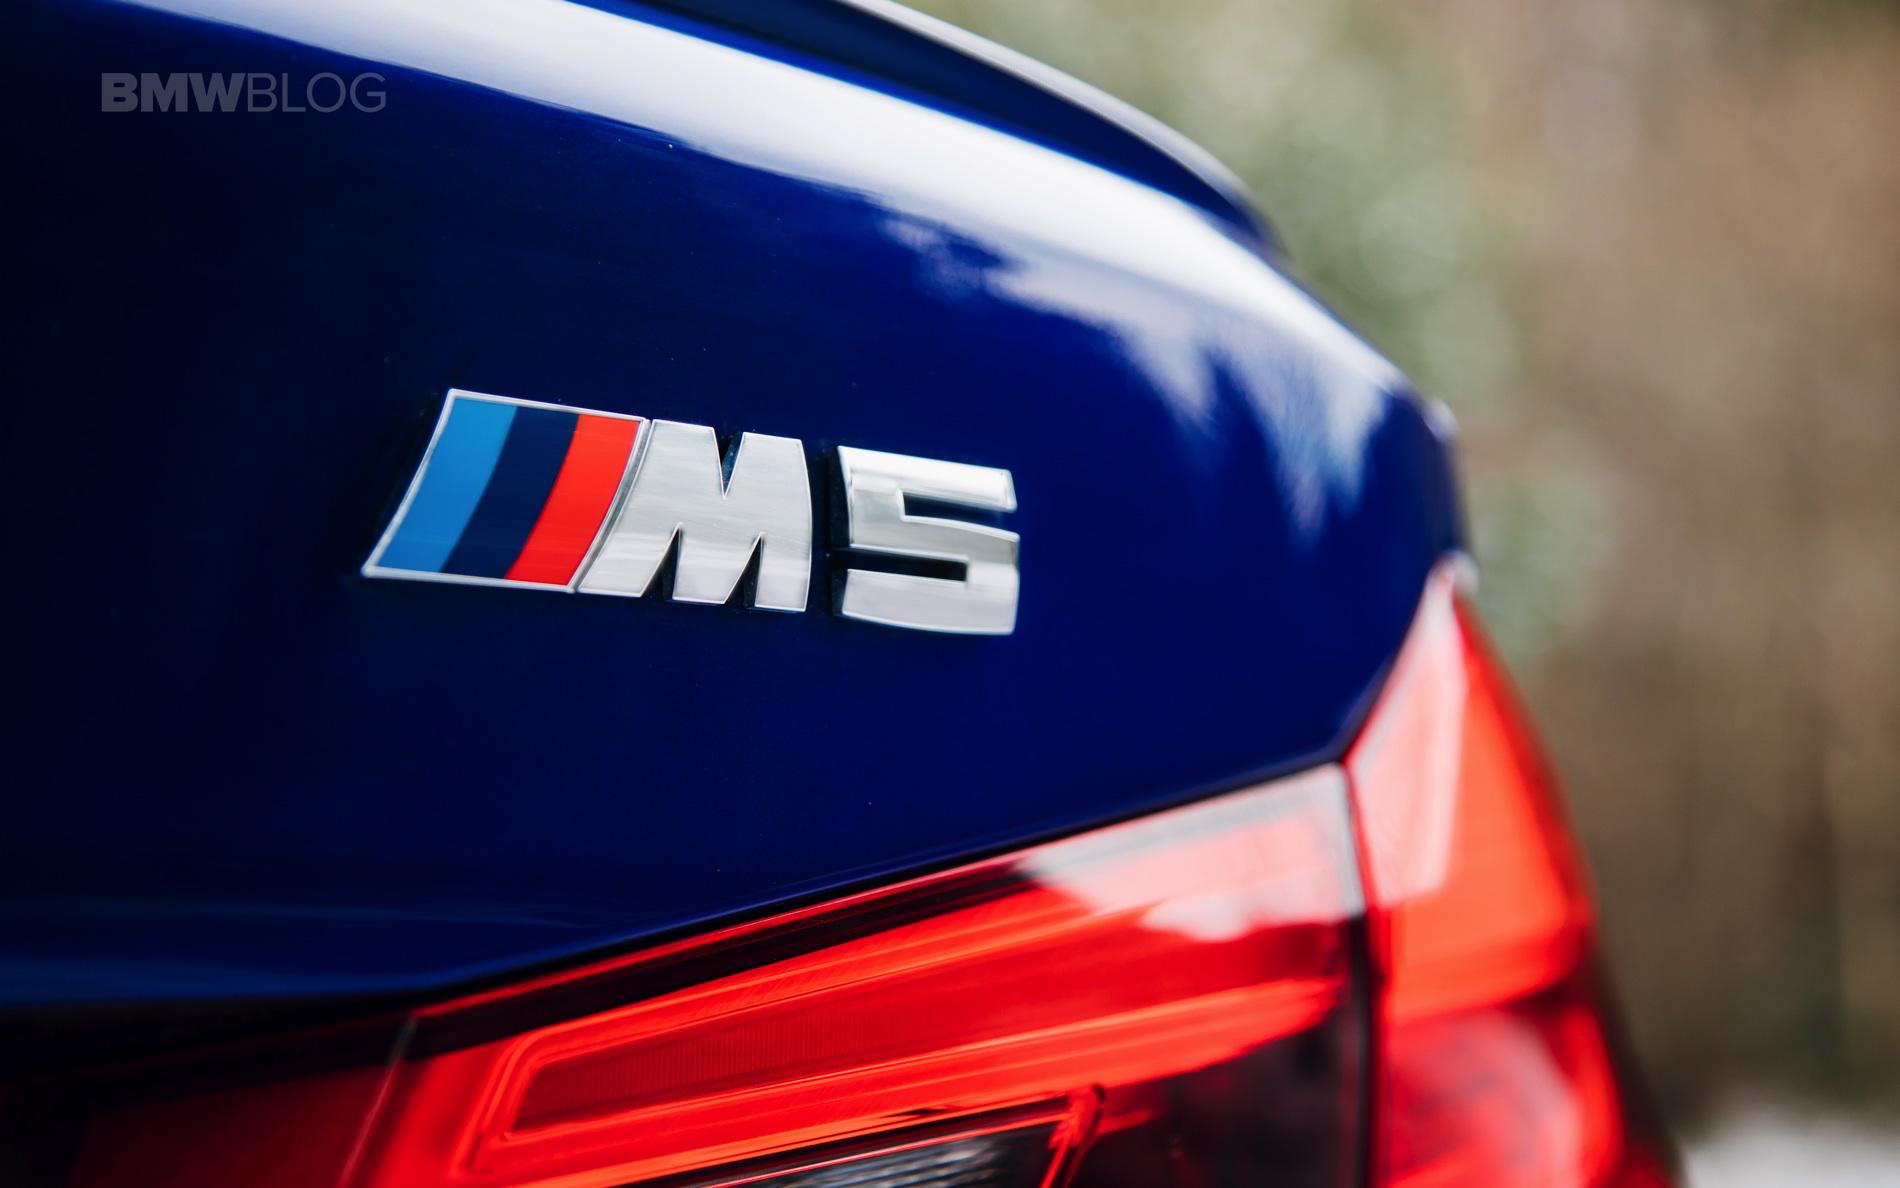 2018 BMW M5 Saloon UK 01